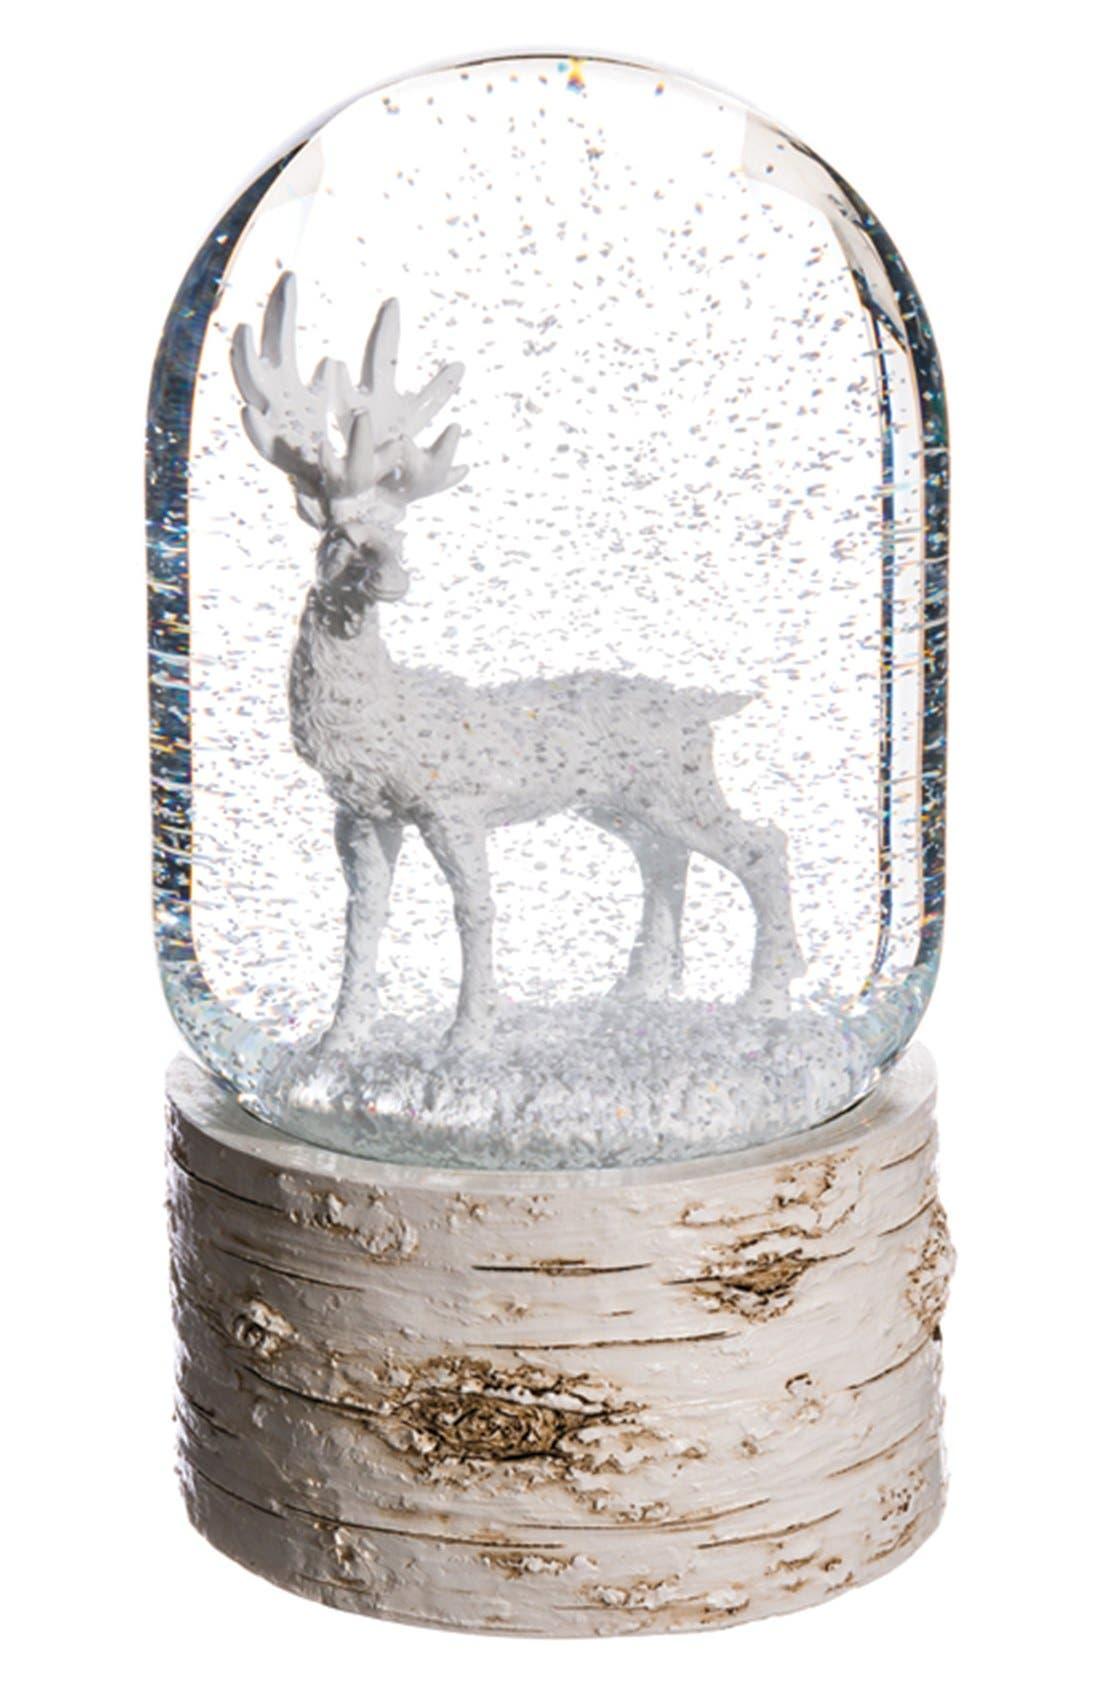 Alternate Image 1 Selected - ALLSTATE Reindeer Musical Snow Globe